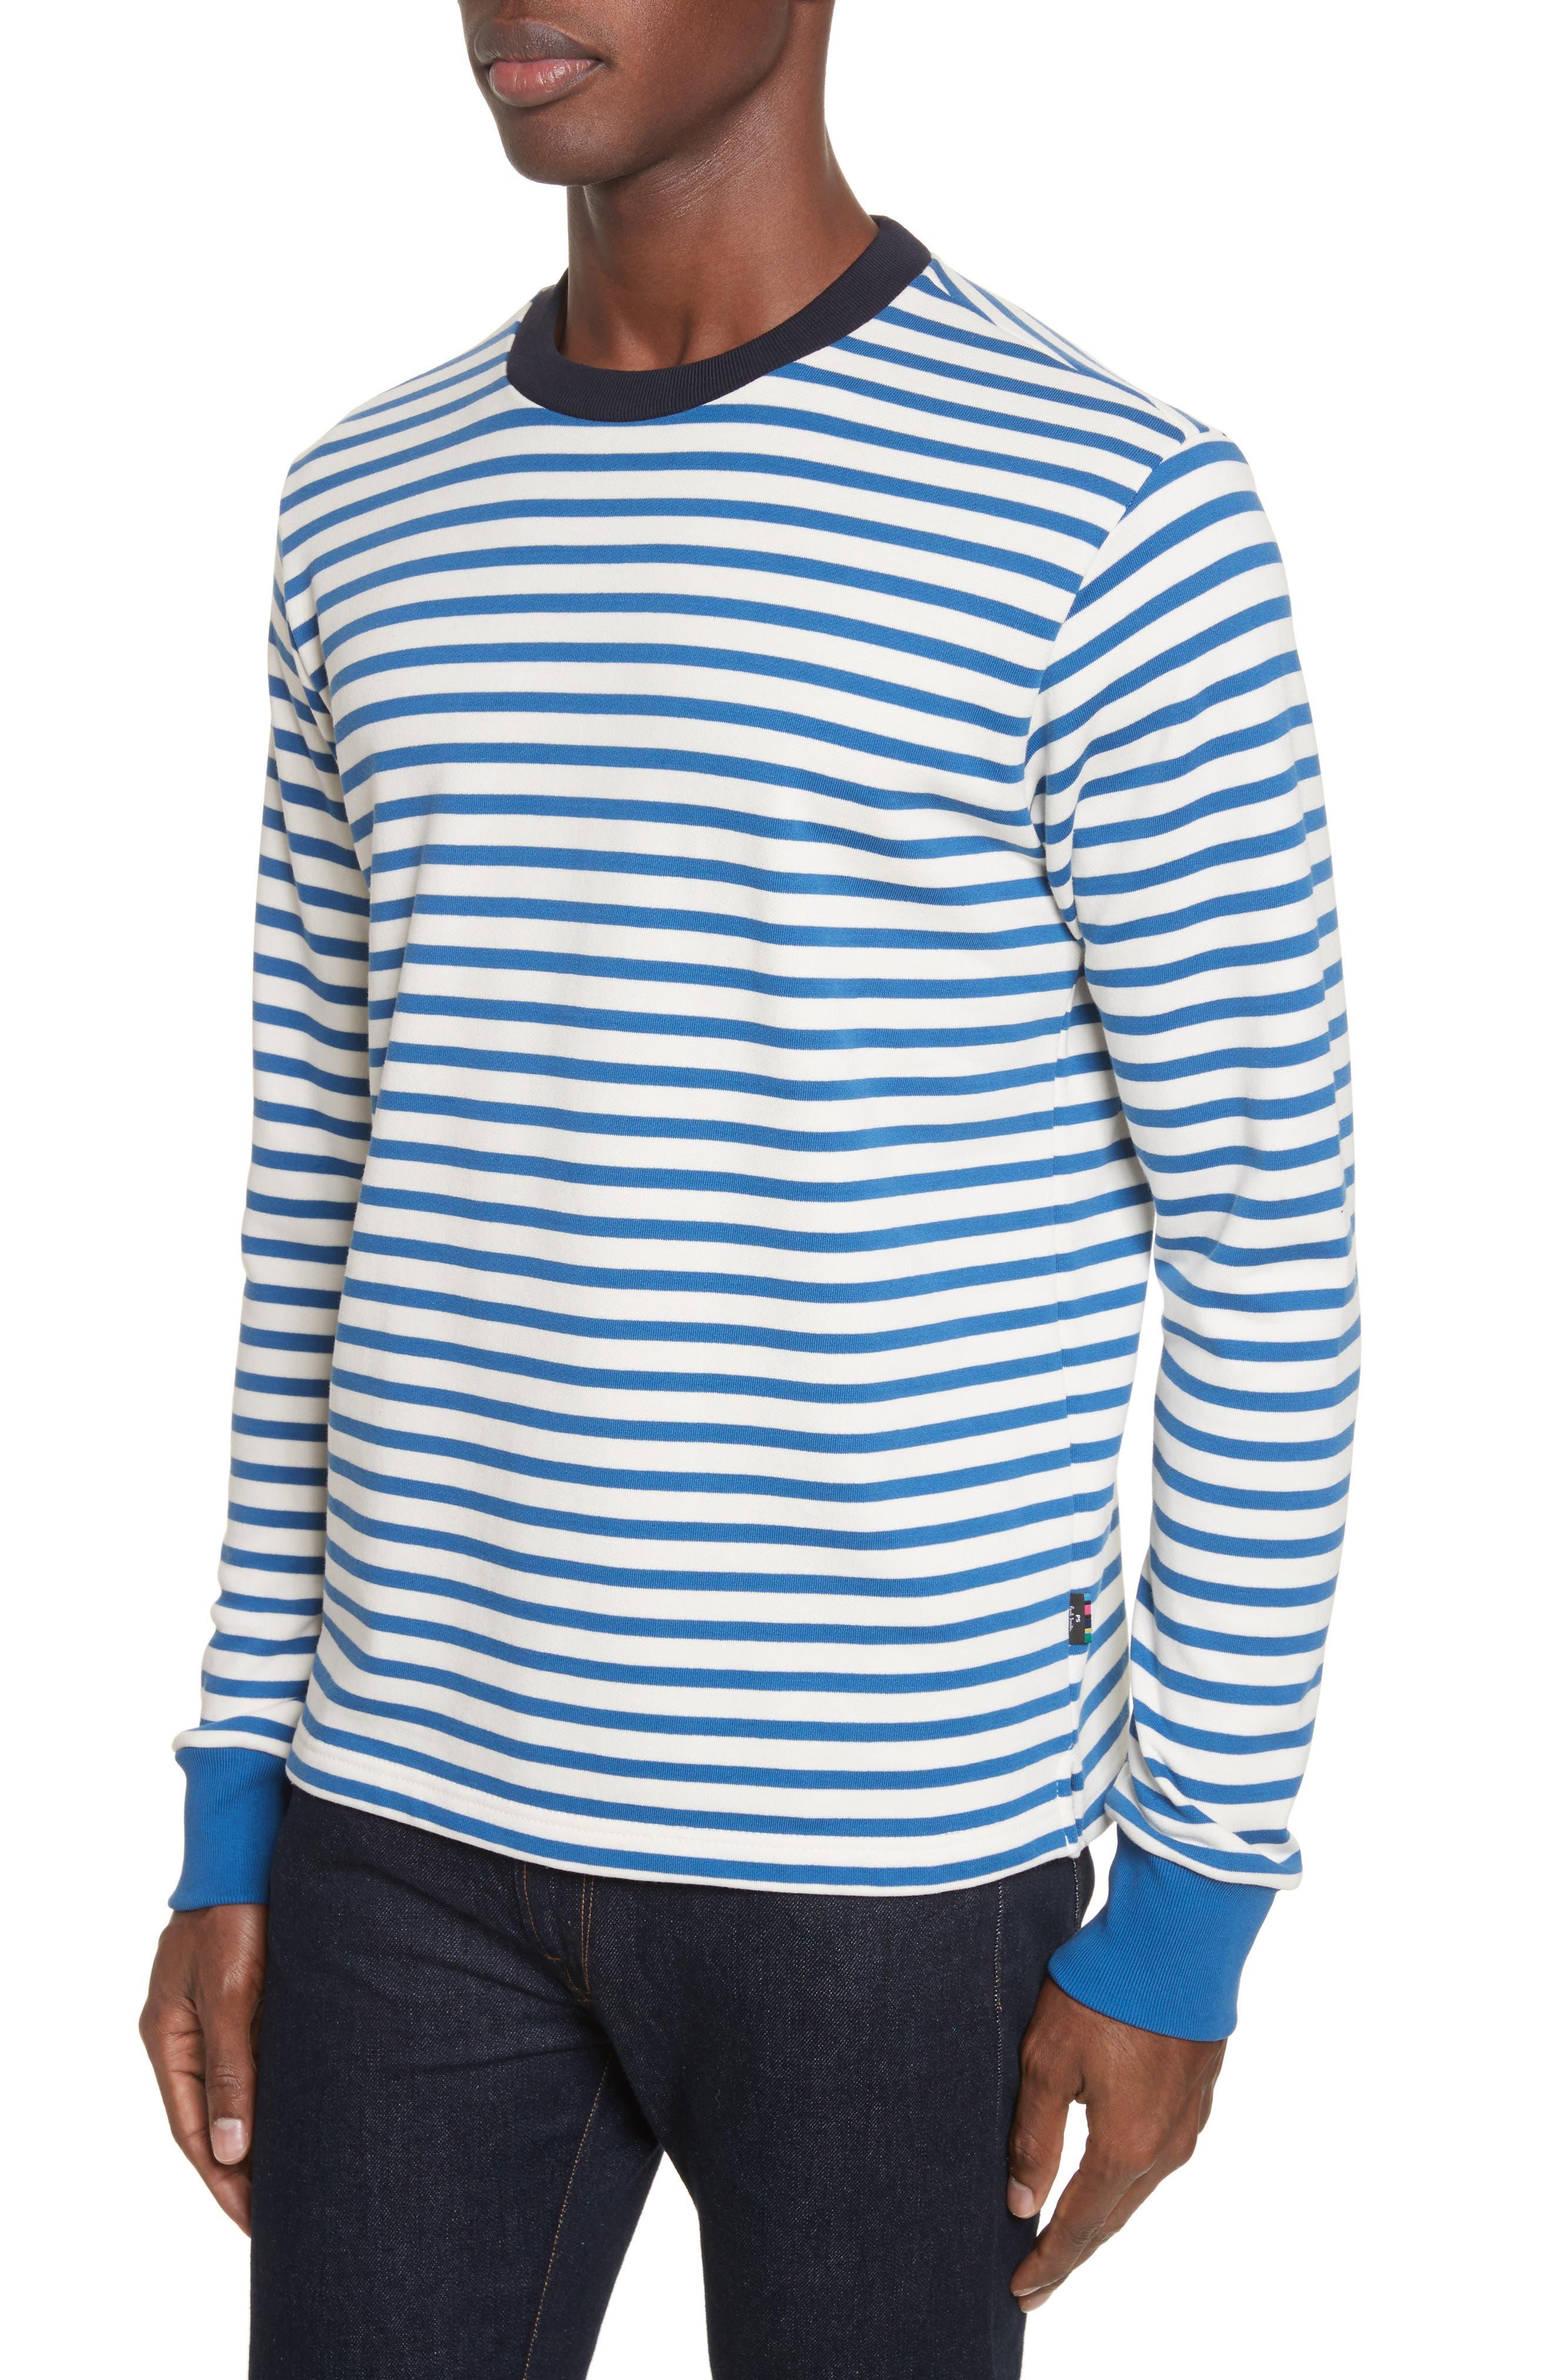 Stripe Crewneck Sweatshirt,                             Alternate thumbnail 4, color,                             434